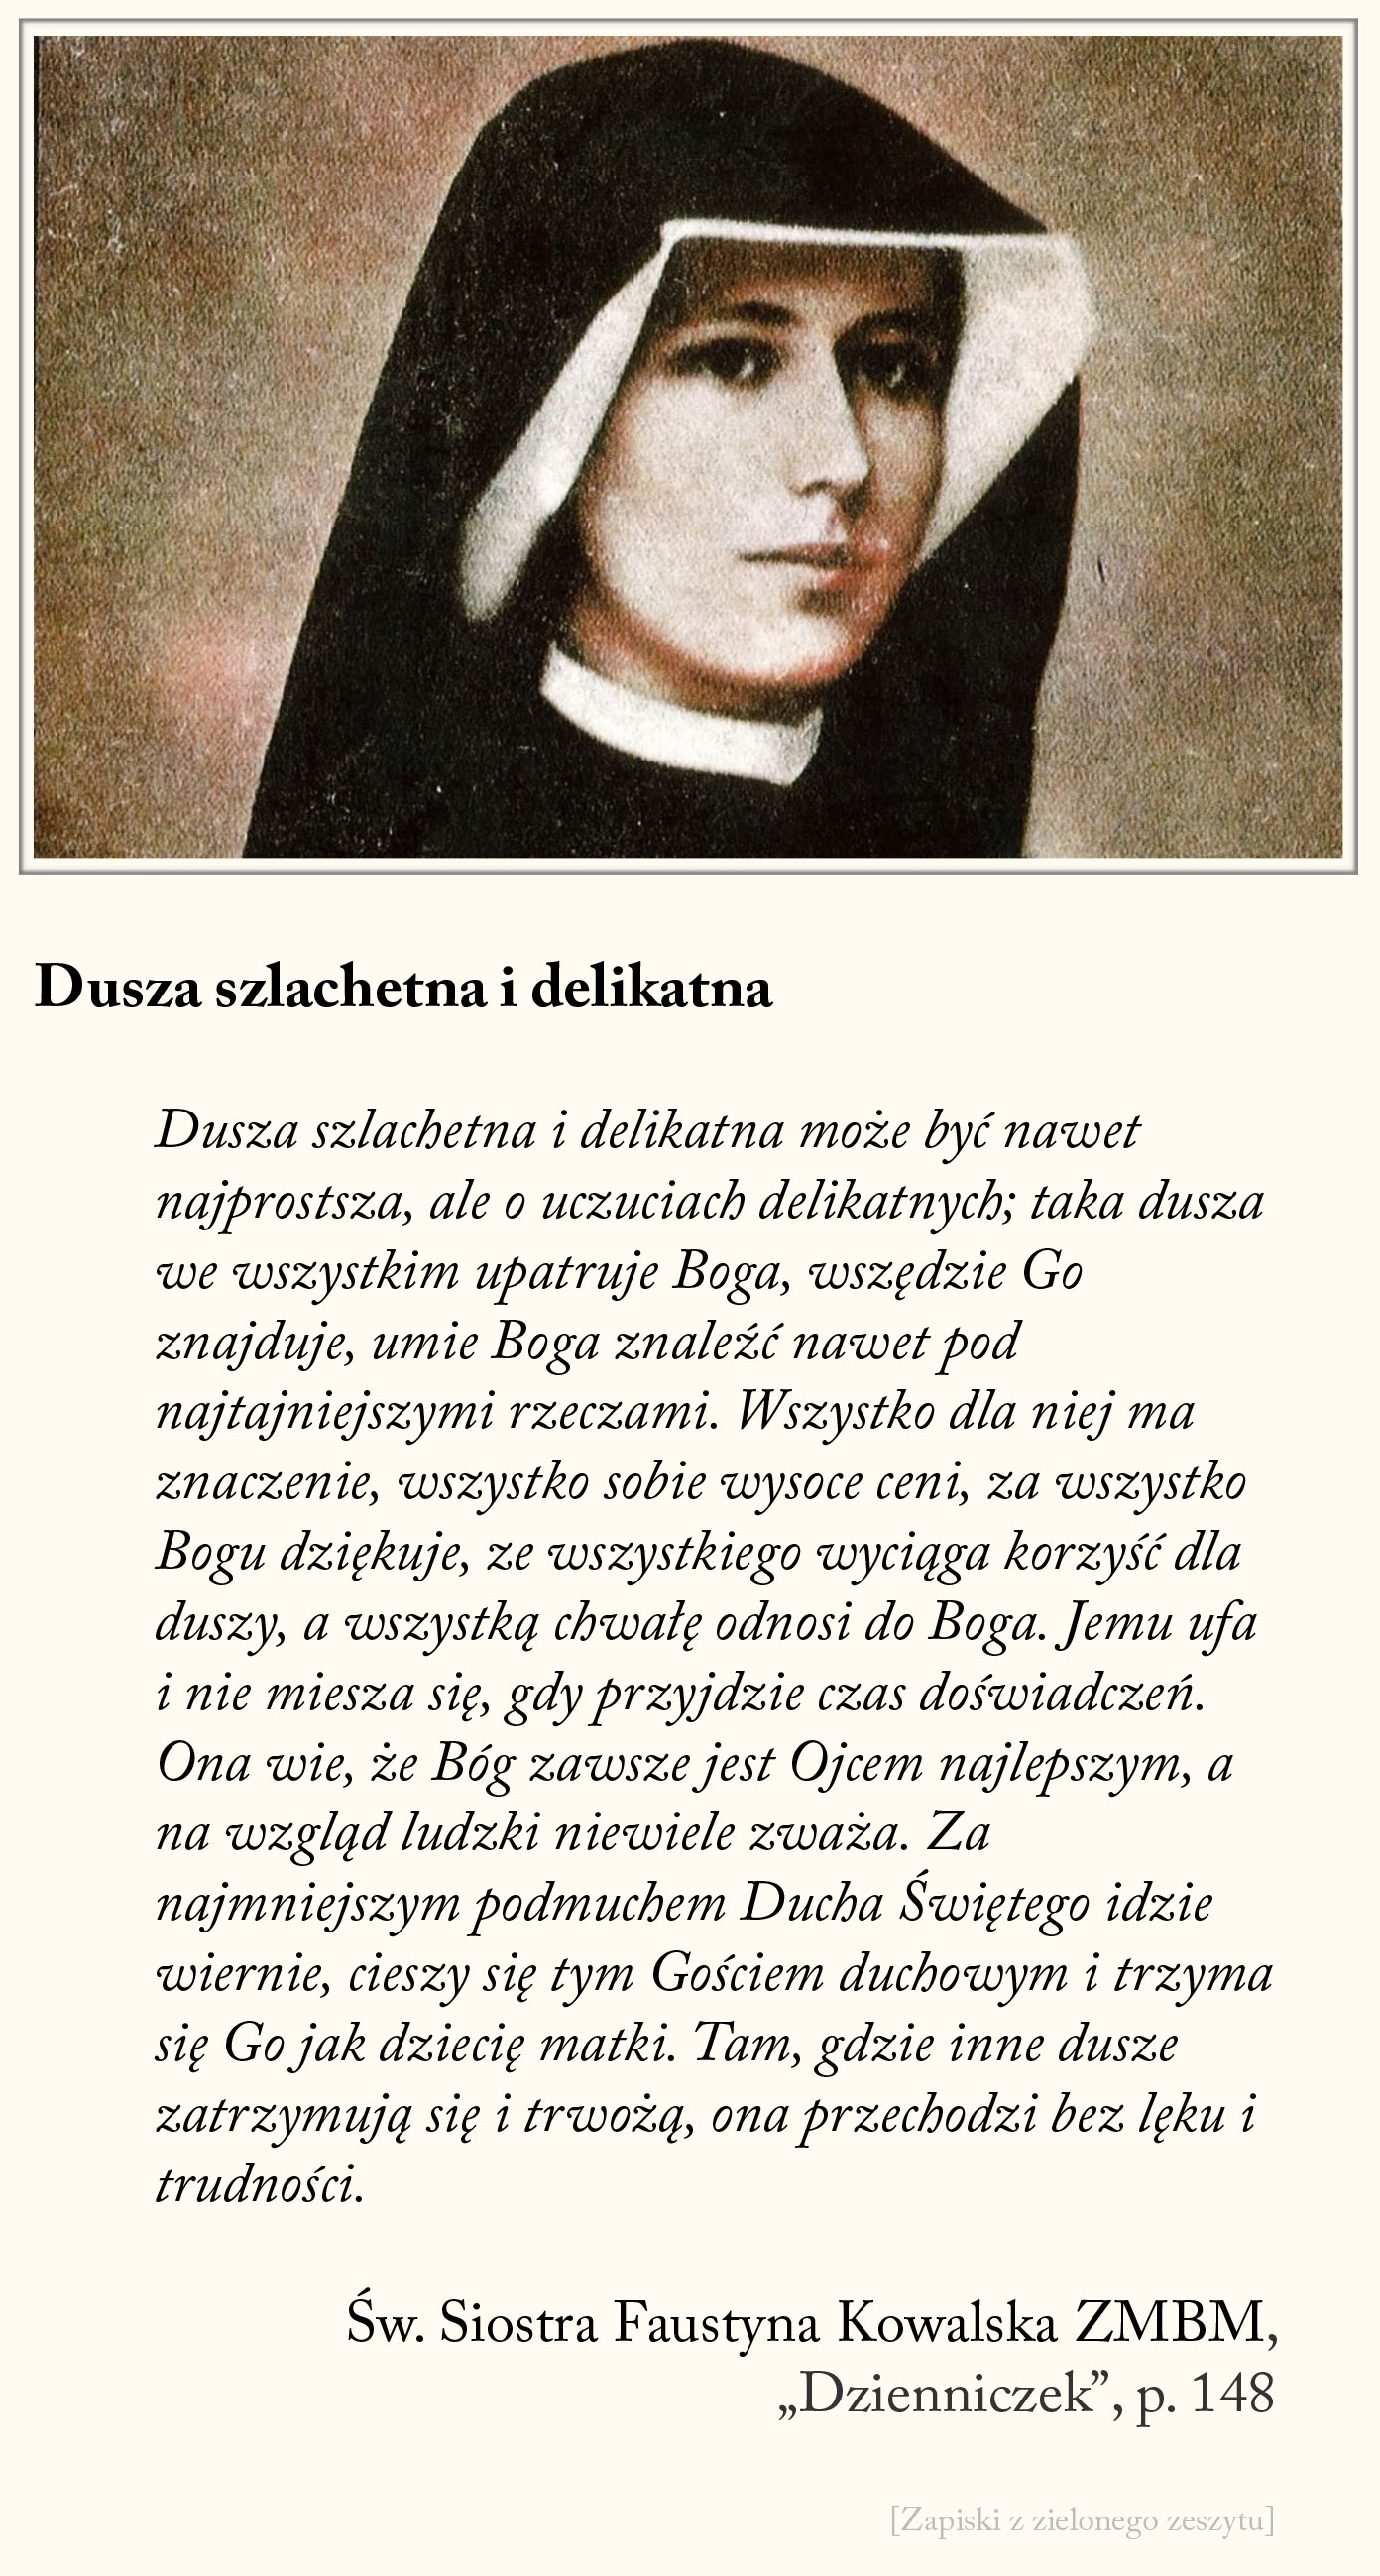 Dusza szlachetna i delikatna, św. Faustyna Kowalska